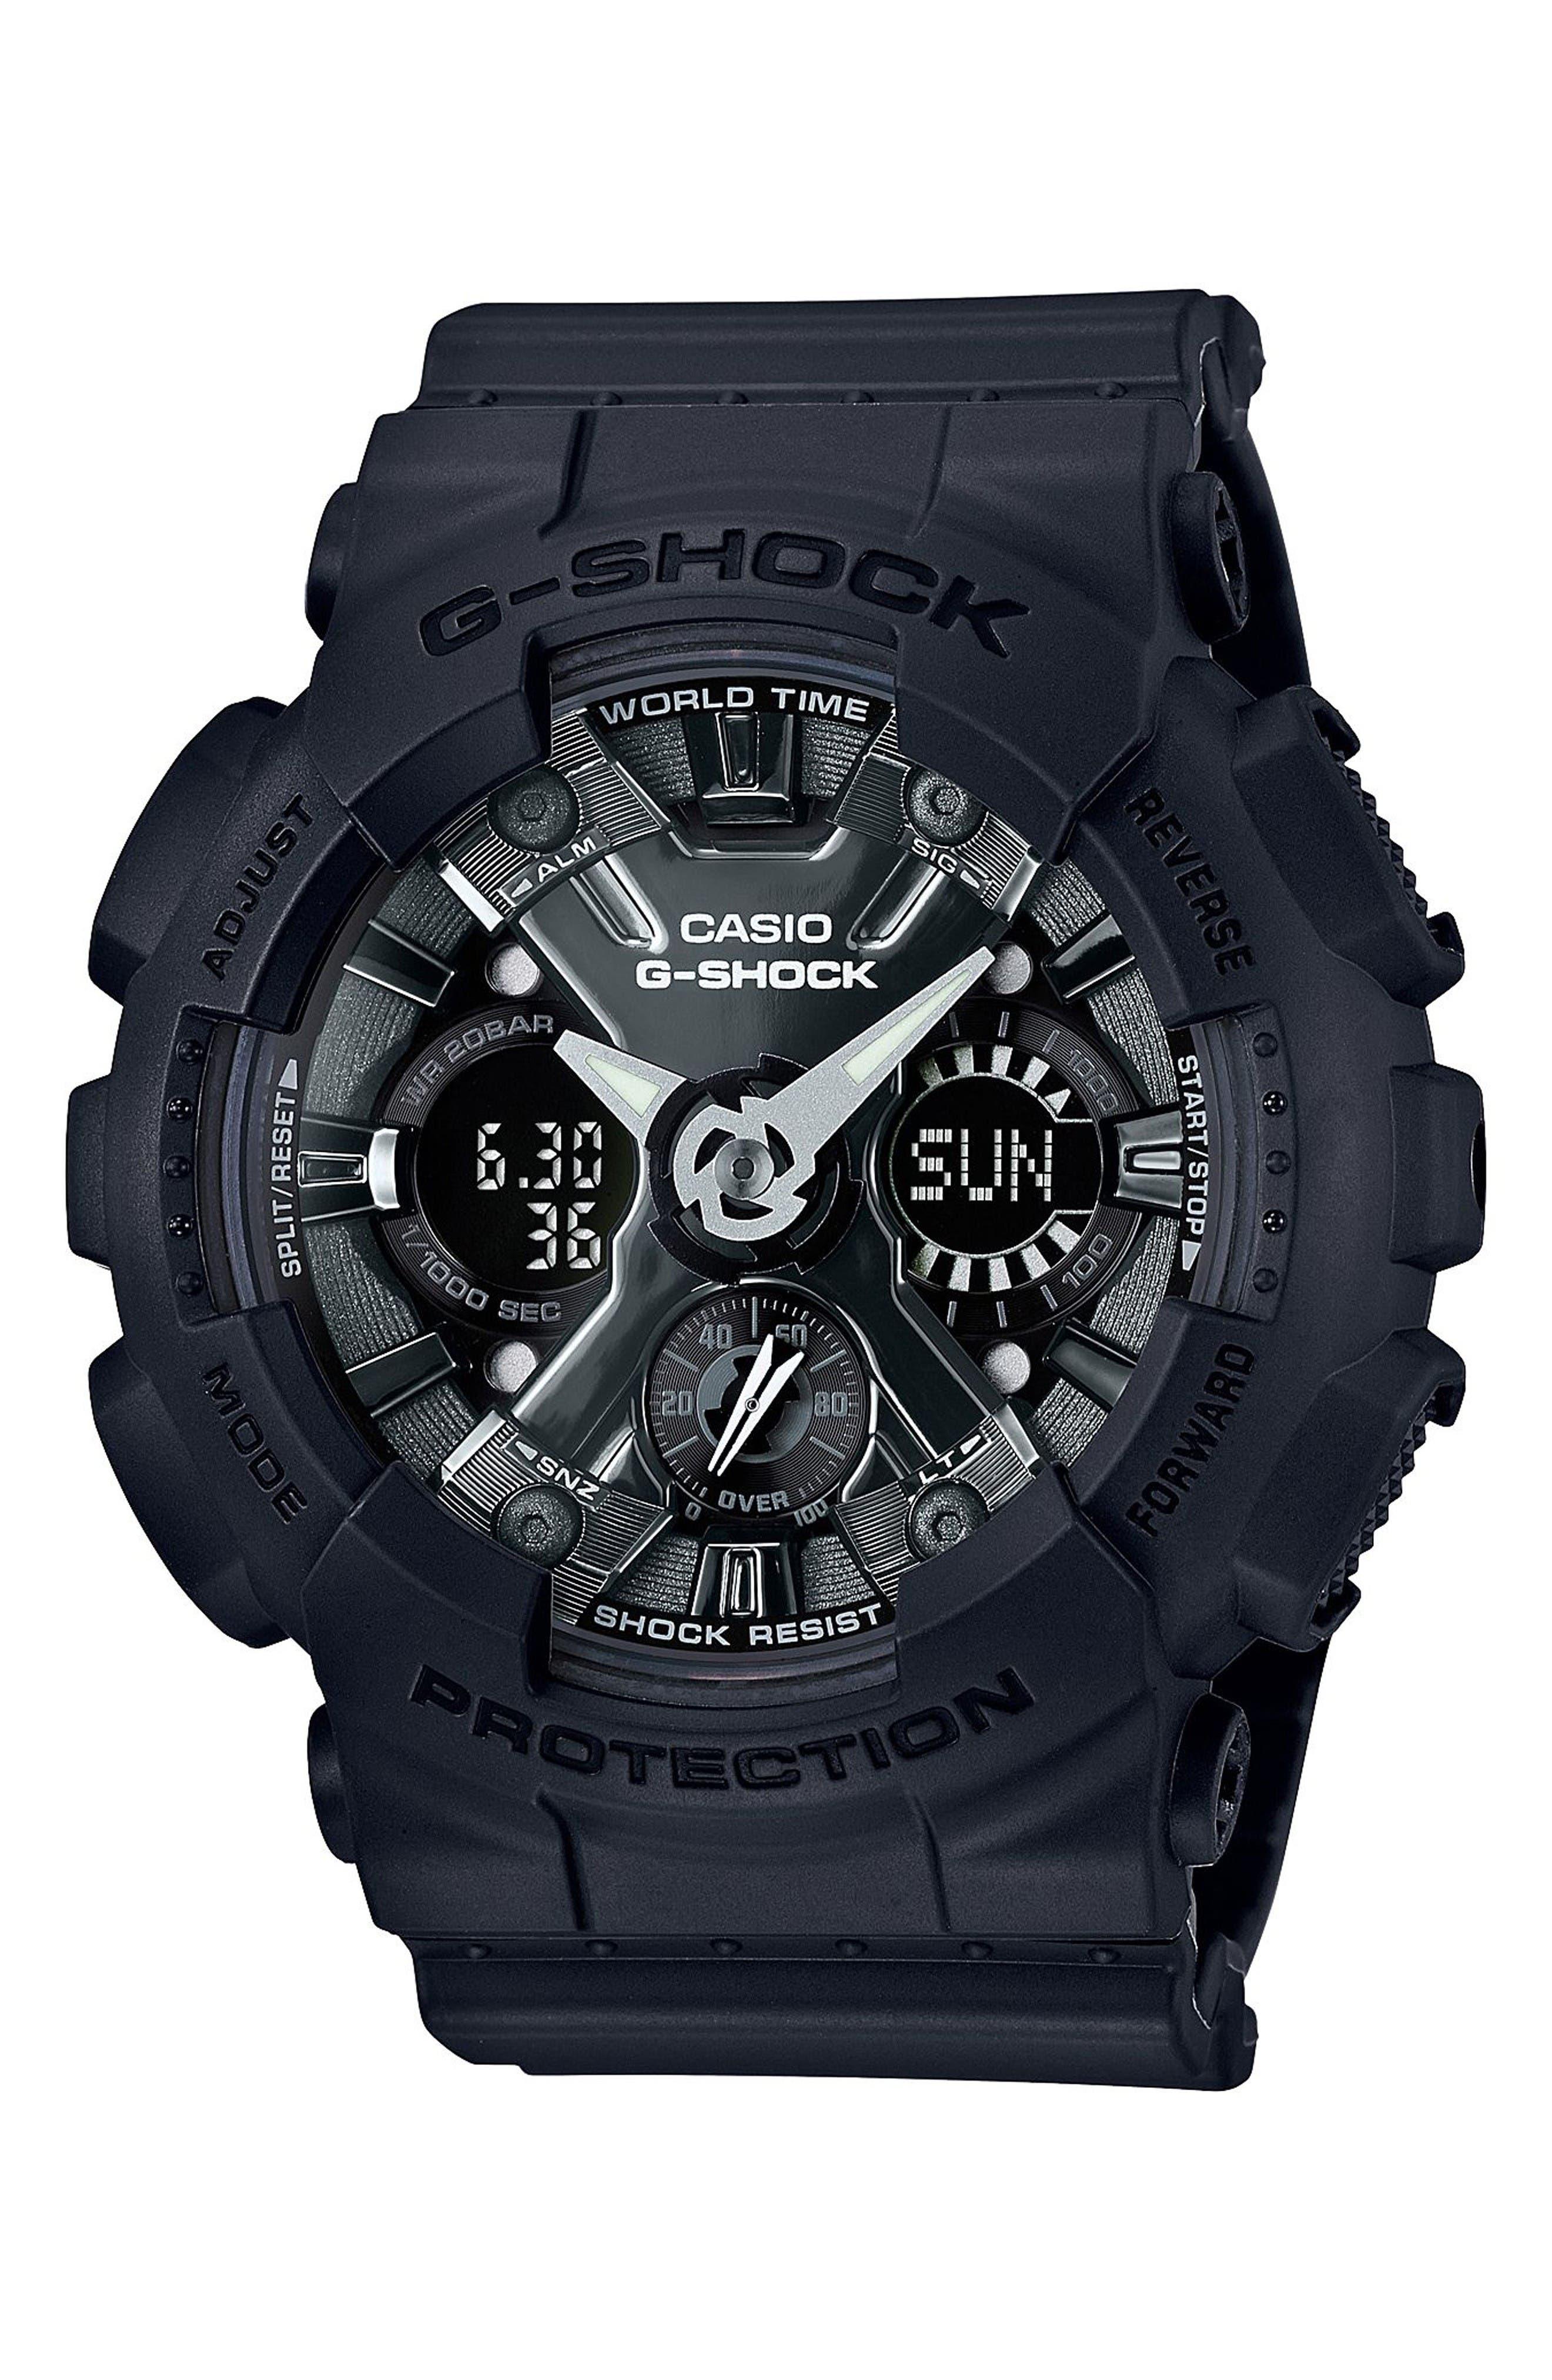 G-SHOCK BABY-G G-Shock S-Series Ana-Digi Watch, 49mm